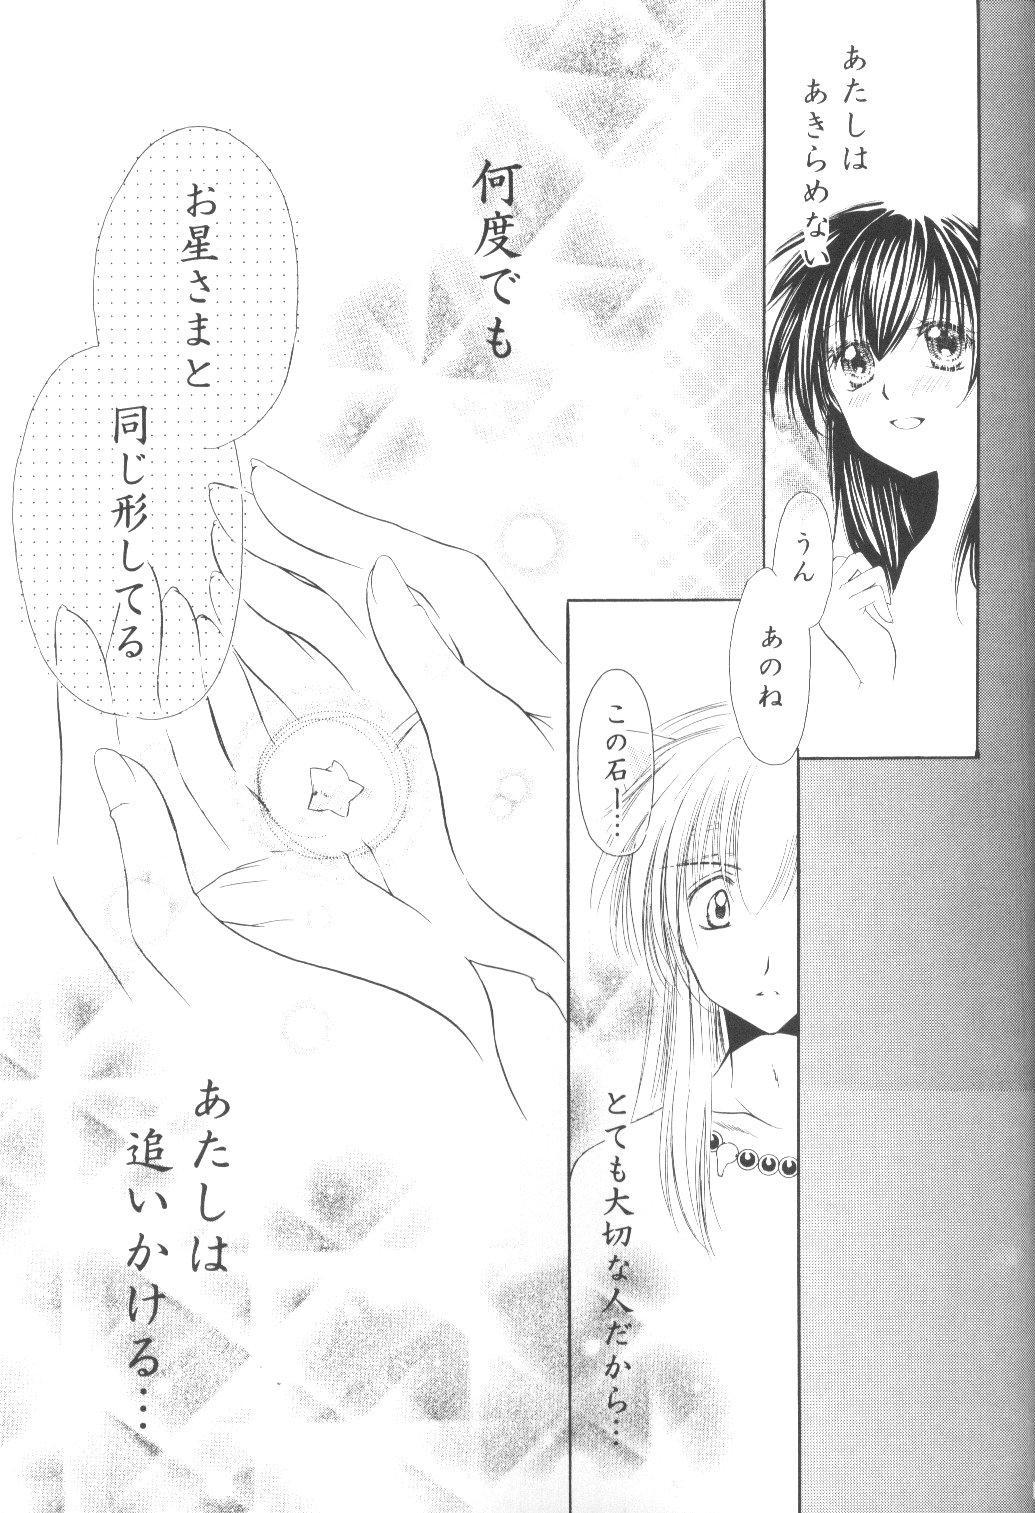 Ryuusei Ryodan 48